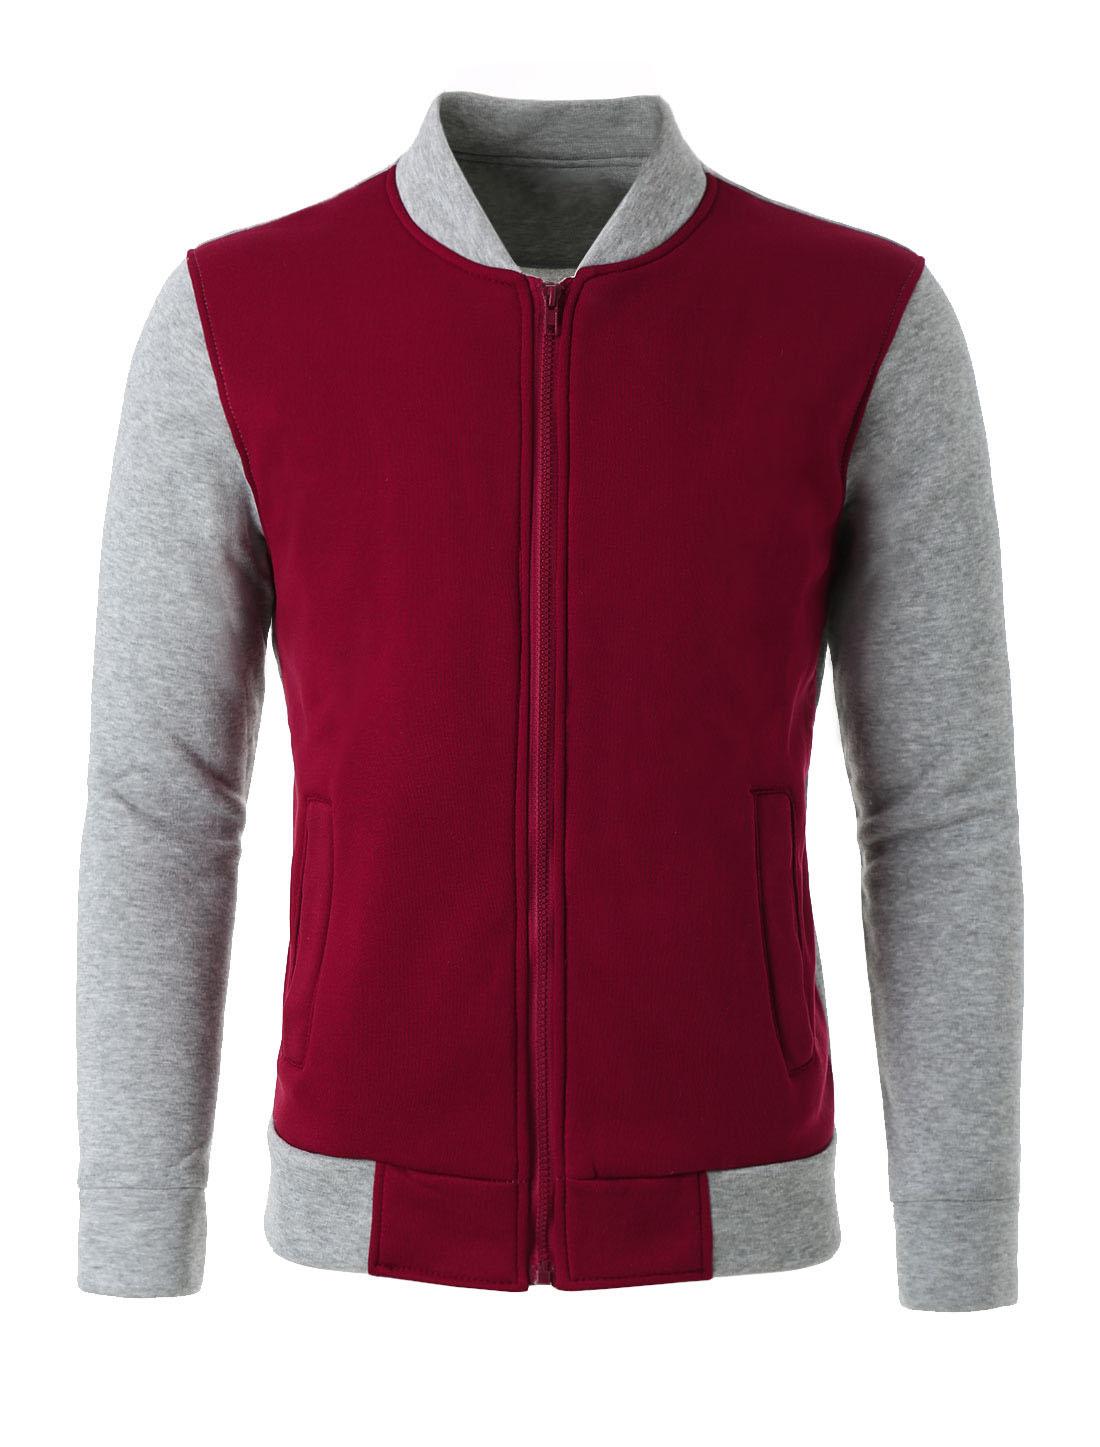 Men Stand Collar Color Block Zipper Front Long Sleeves Cozy Outdoor Varsity Jacket Burgundy Light Gray M